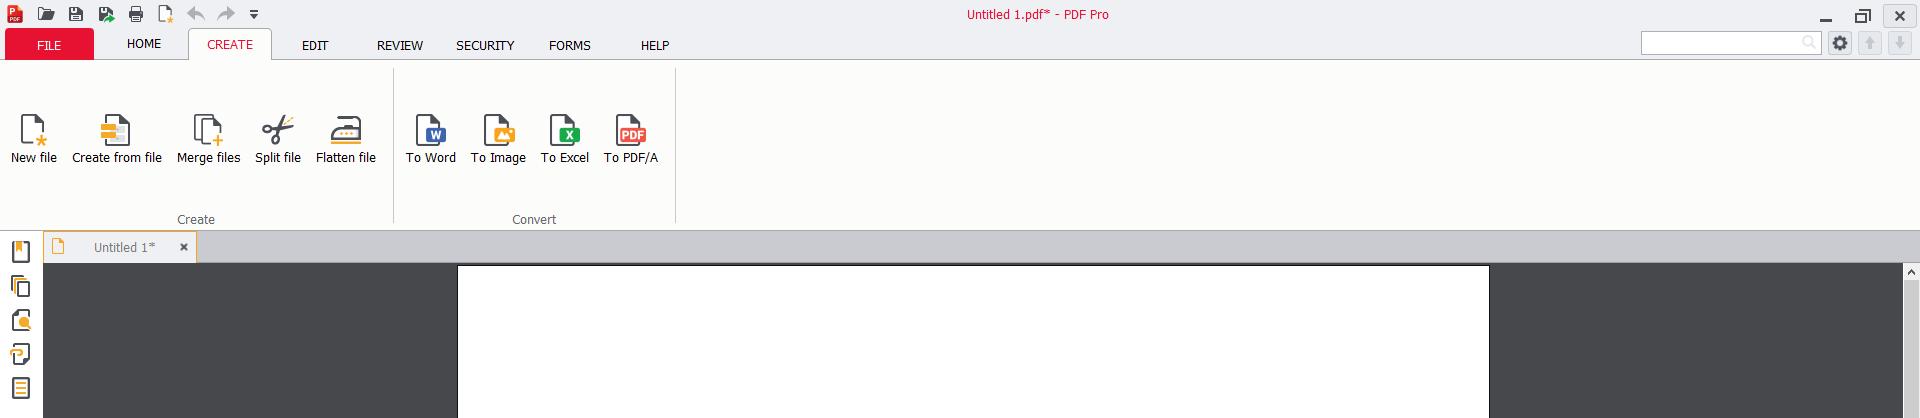 PDF Pro, Business & Finance Software Screenshot